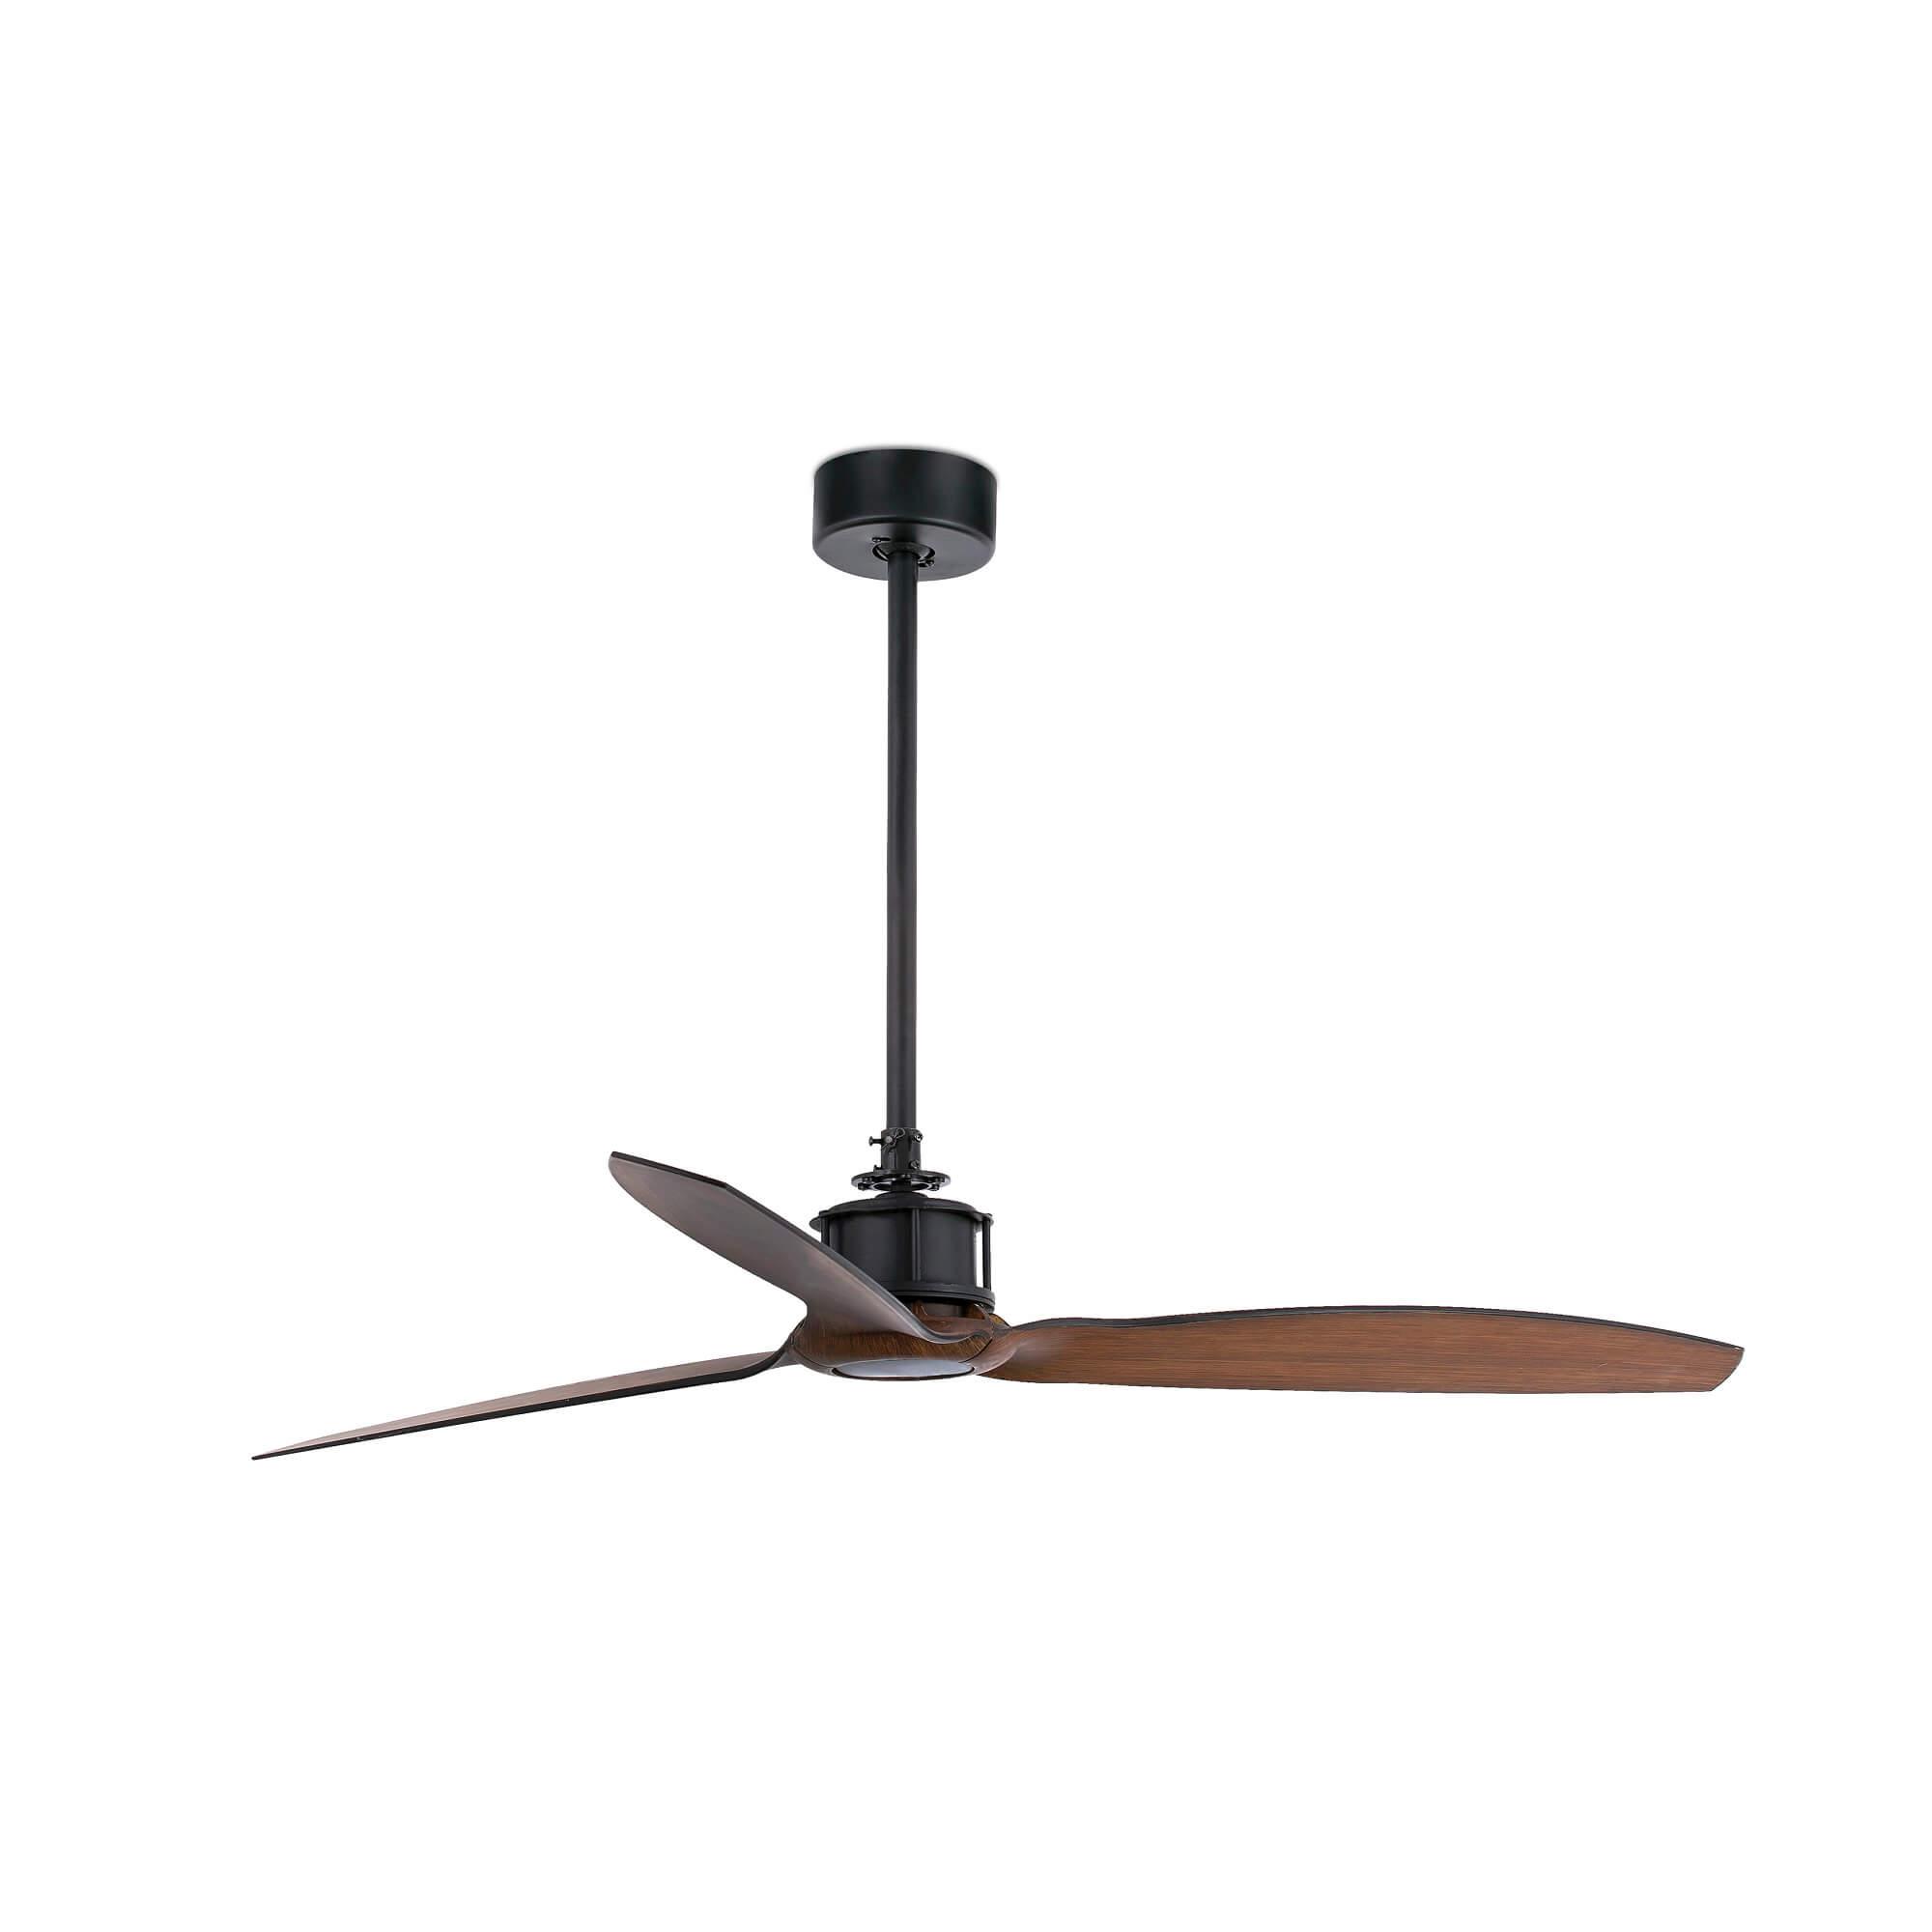 Stropný ventilátor FARO JUST FAN 33395